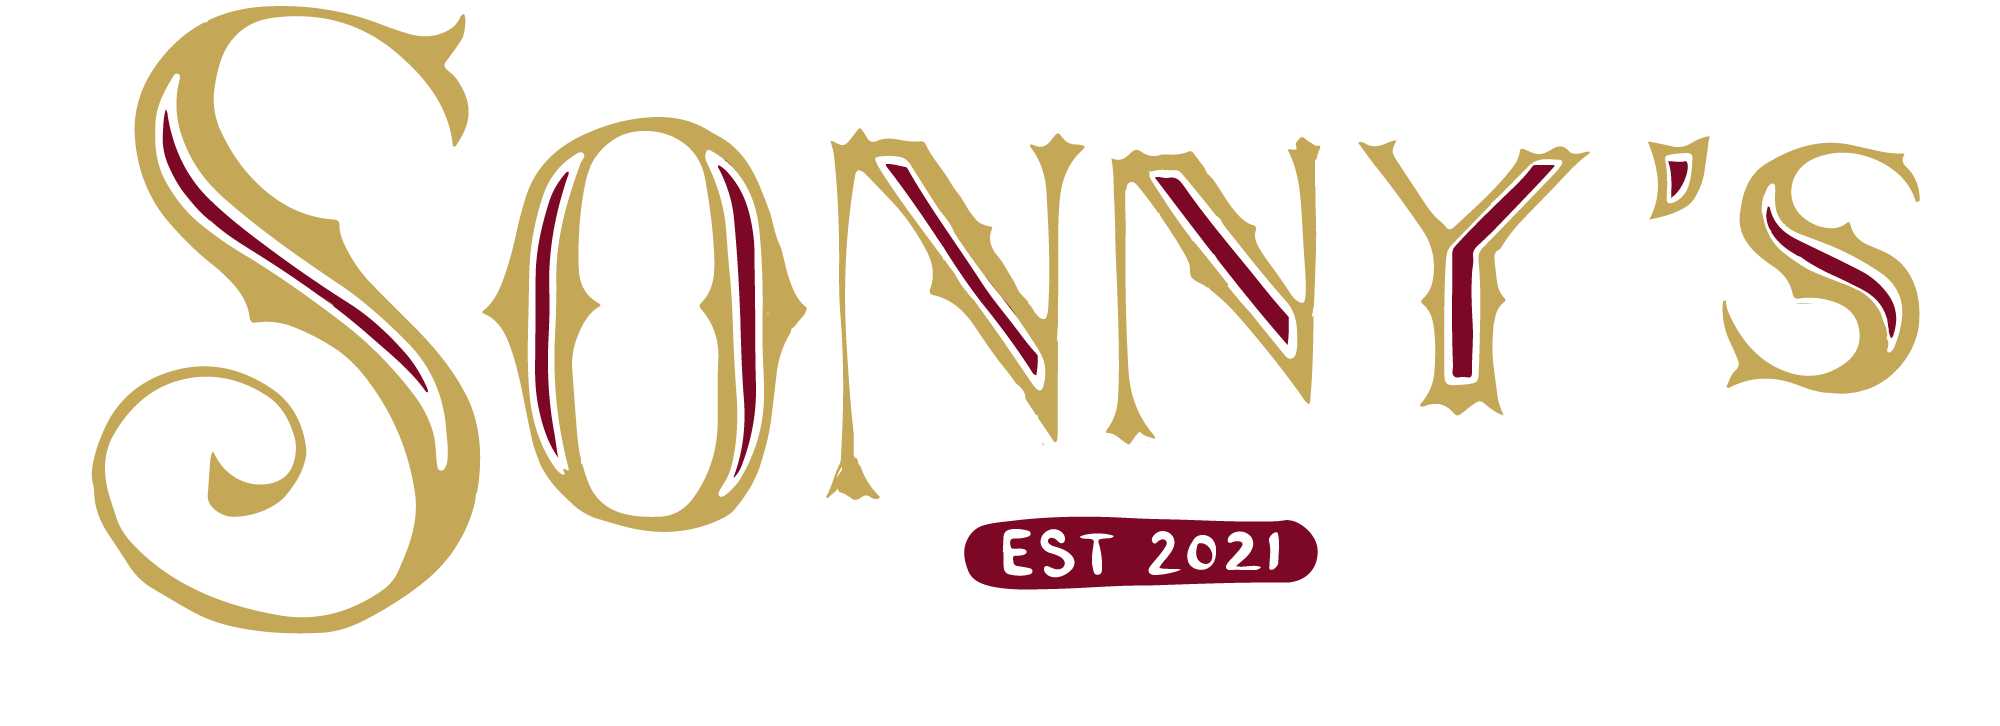 Sonny's Tacos (starts September 29th!) Logo